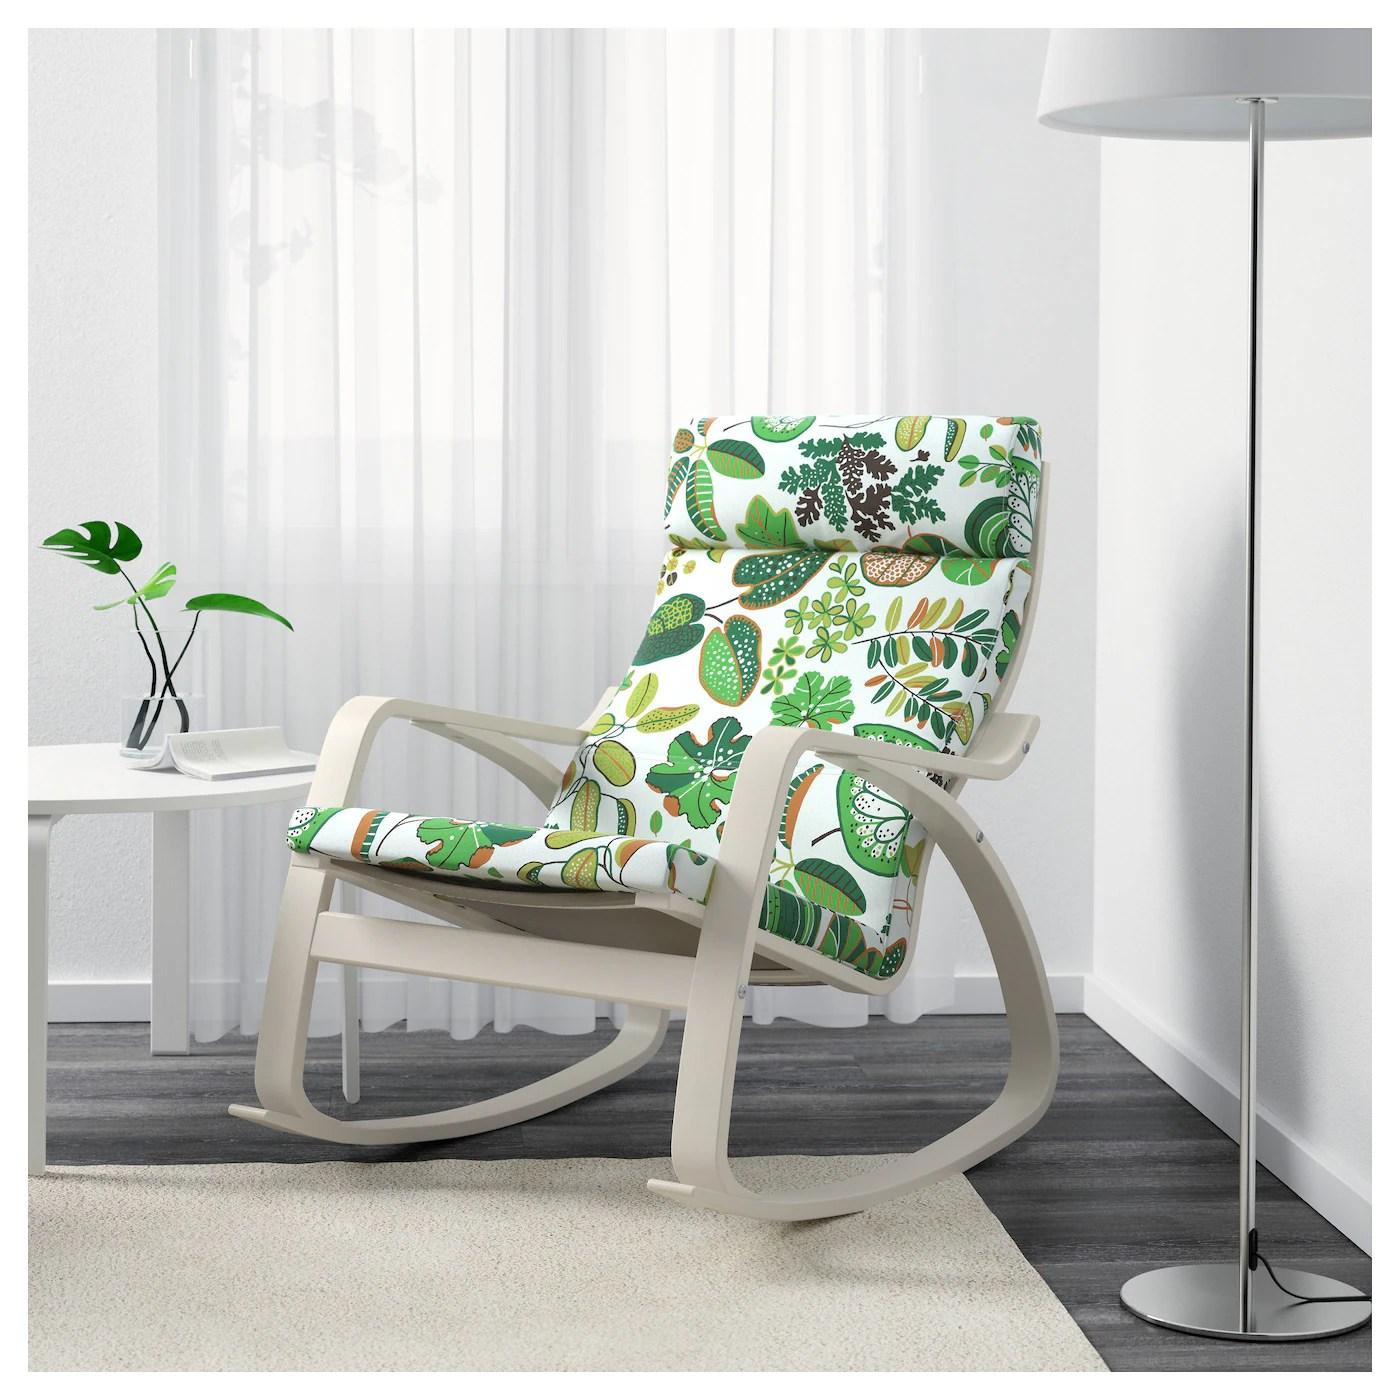 ikea white rocking chair pottery barn wicker cushions poÄng simmarp green